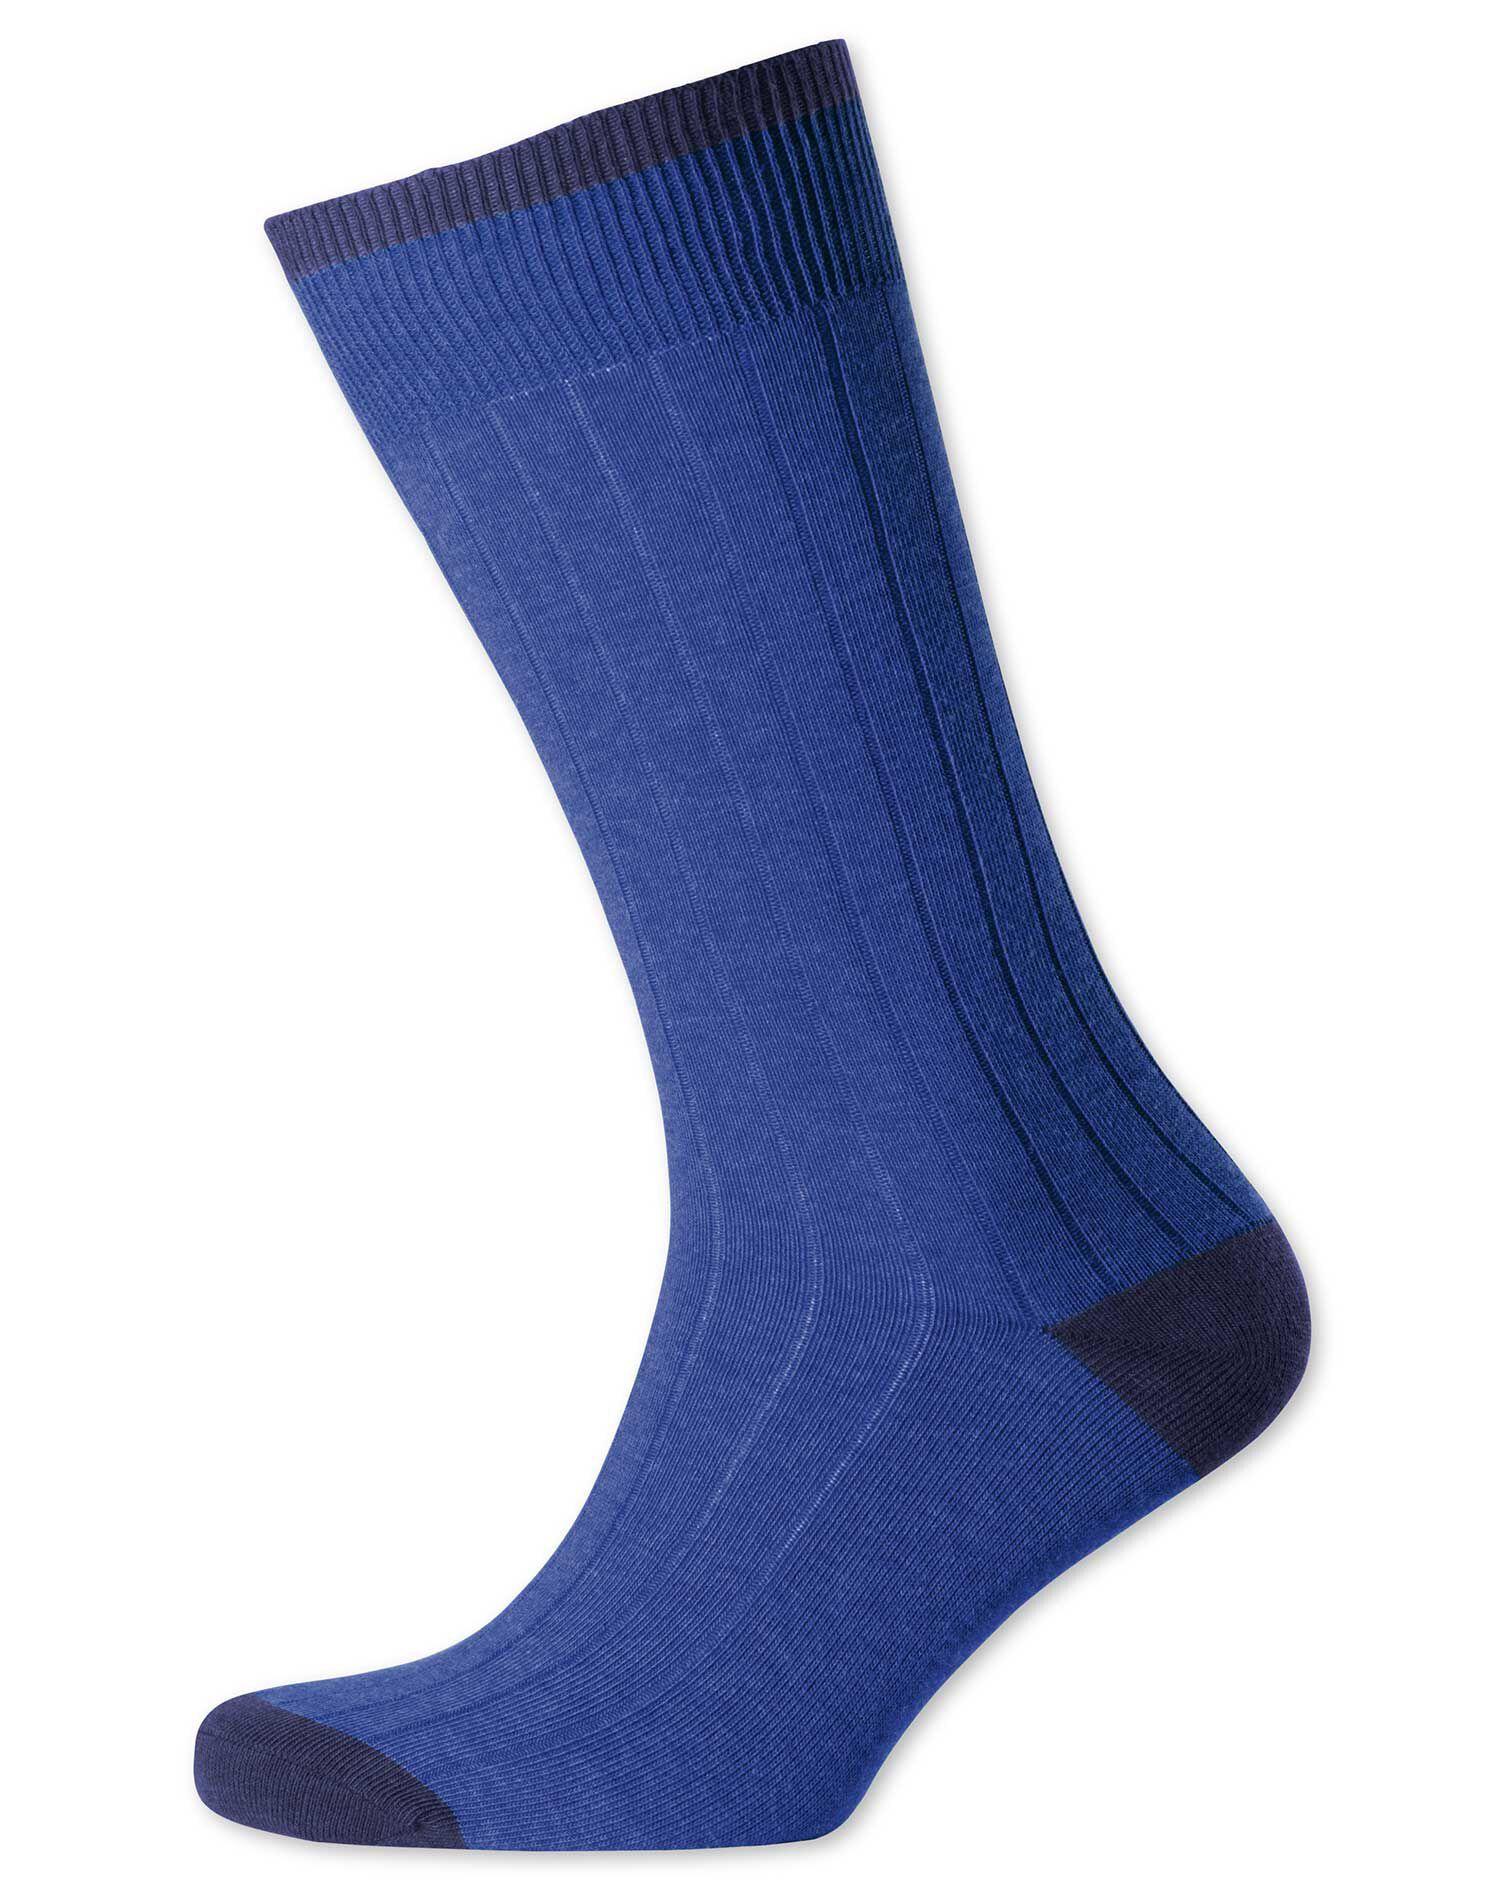 Royal Ribbed Socks Size Medium by Charles Tyrwhitt